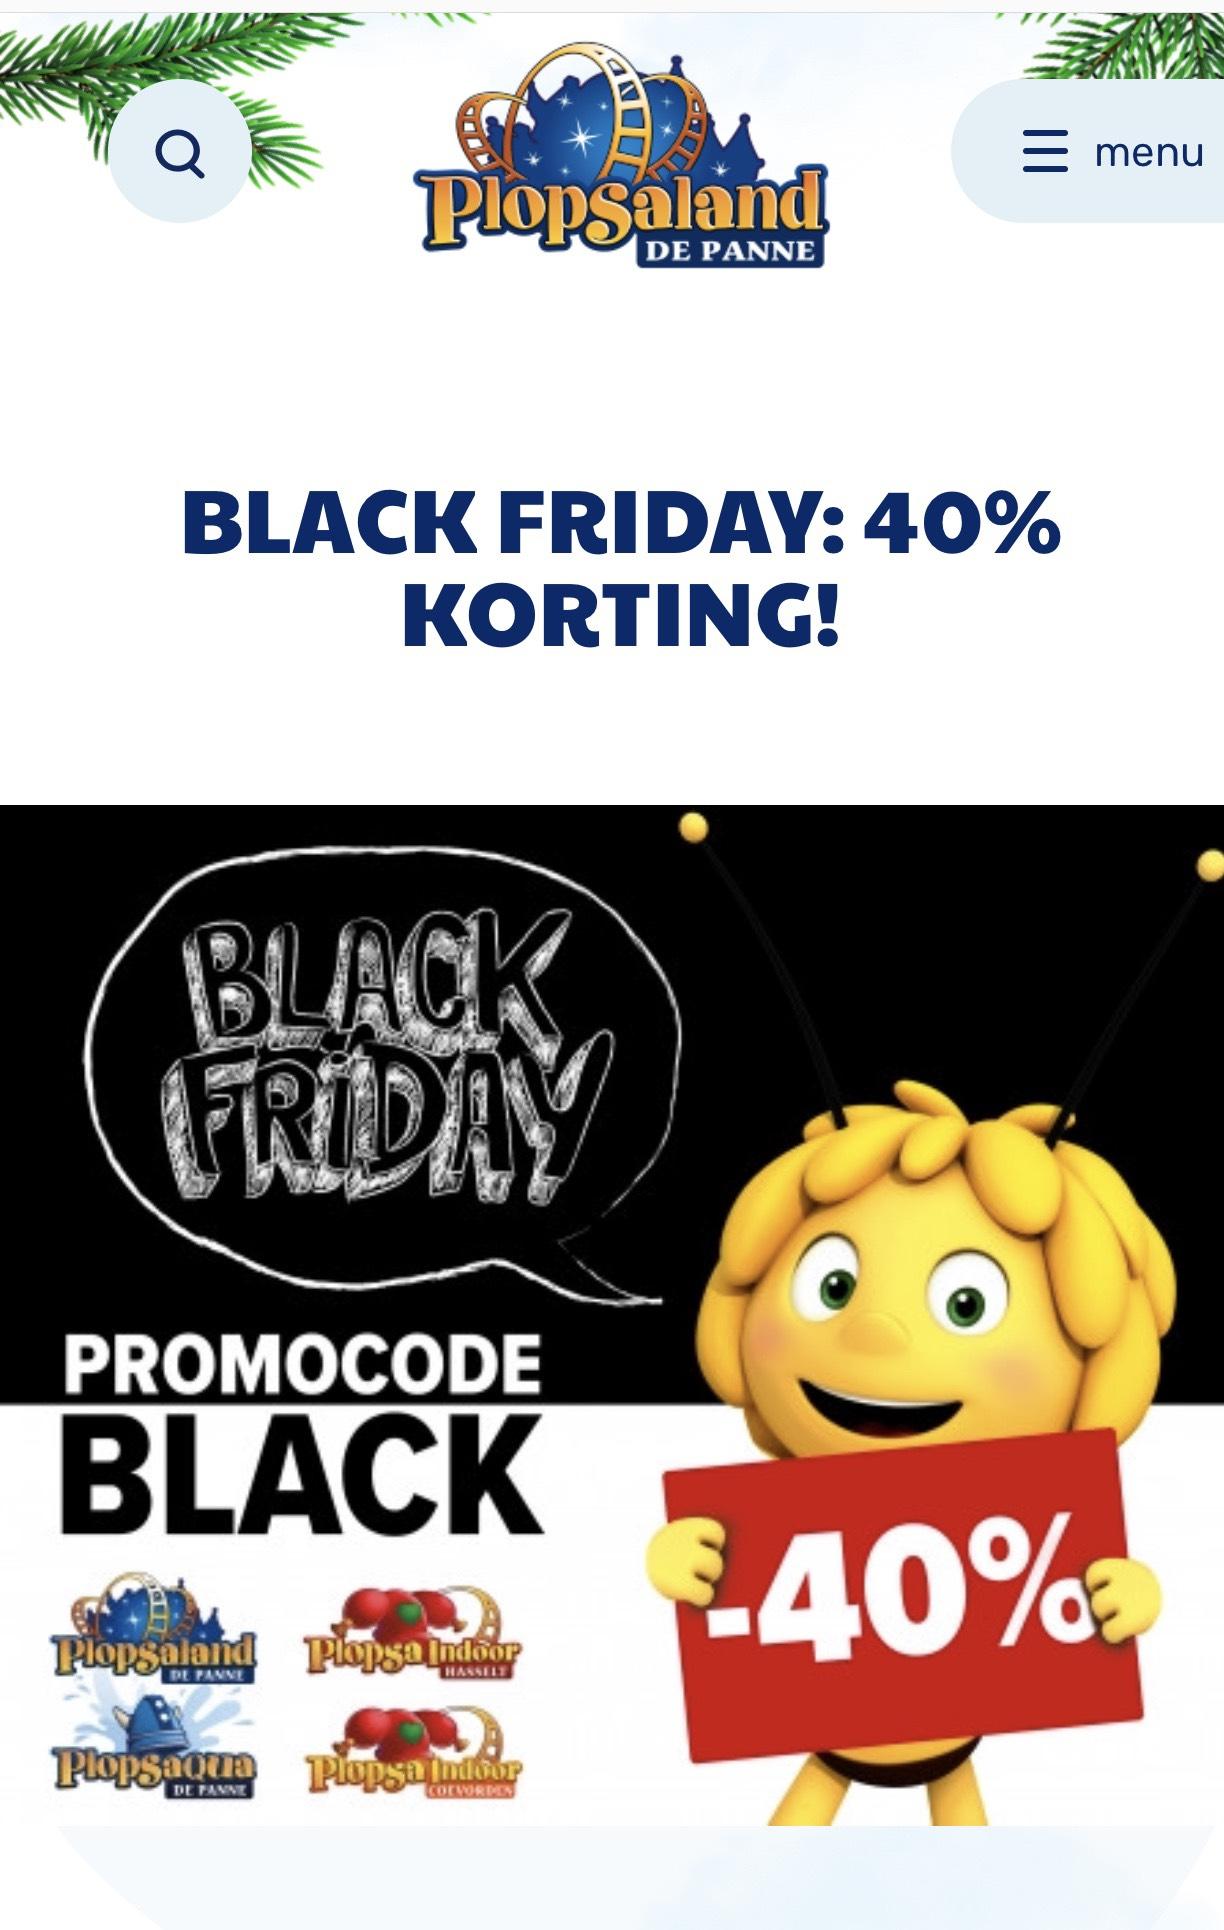 Black friday 40% korting bij Plopsaland